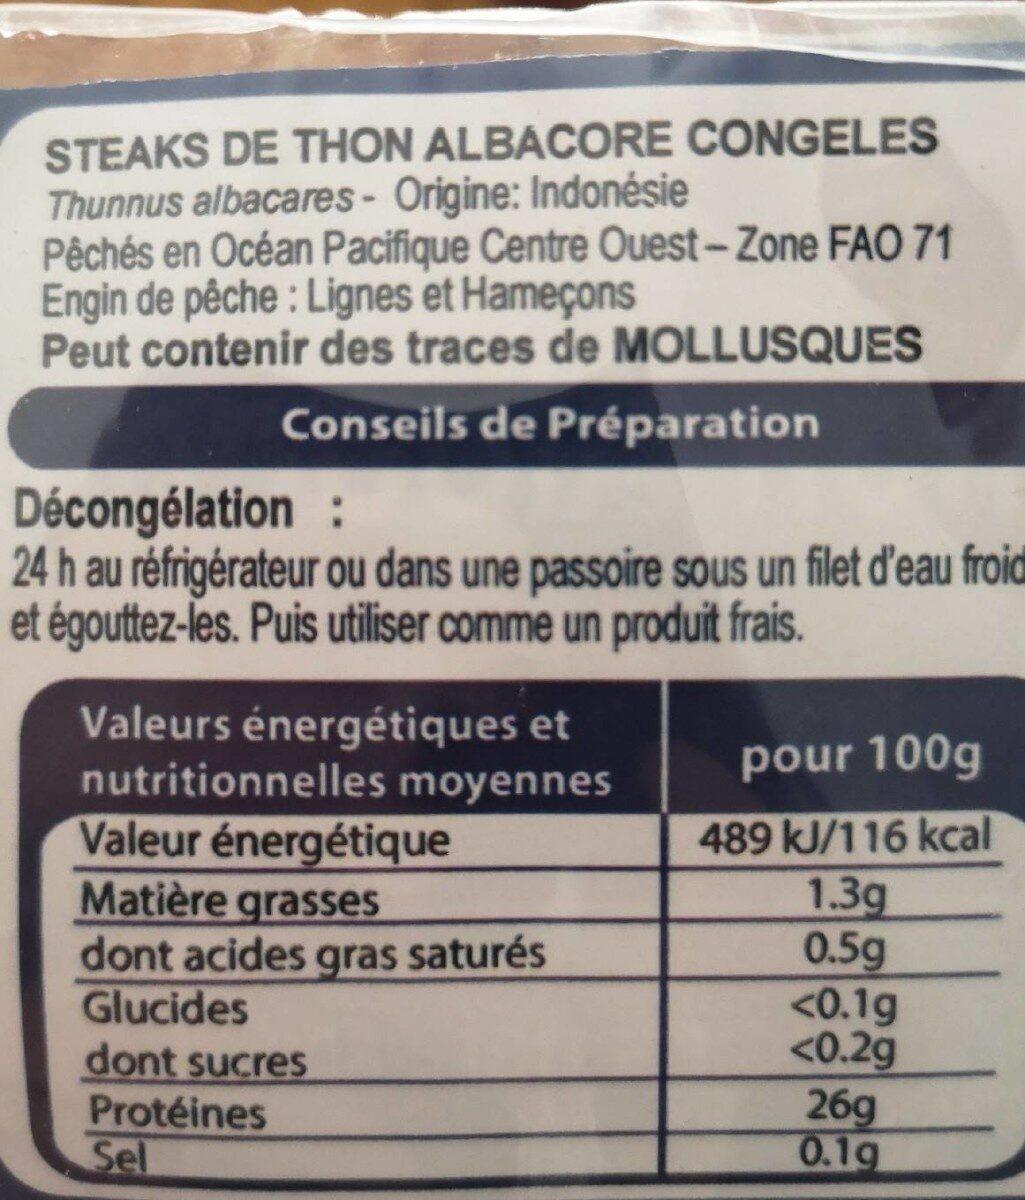 Steaks de thon albacore - Valori nutrizionali - fr